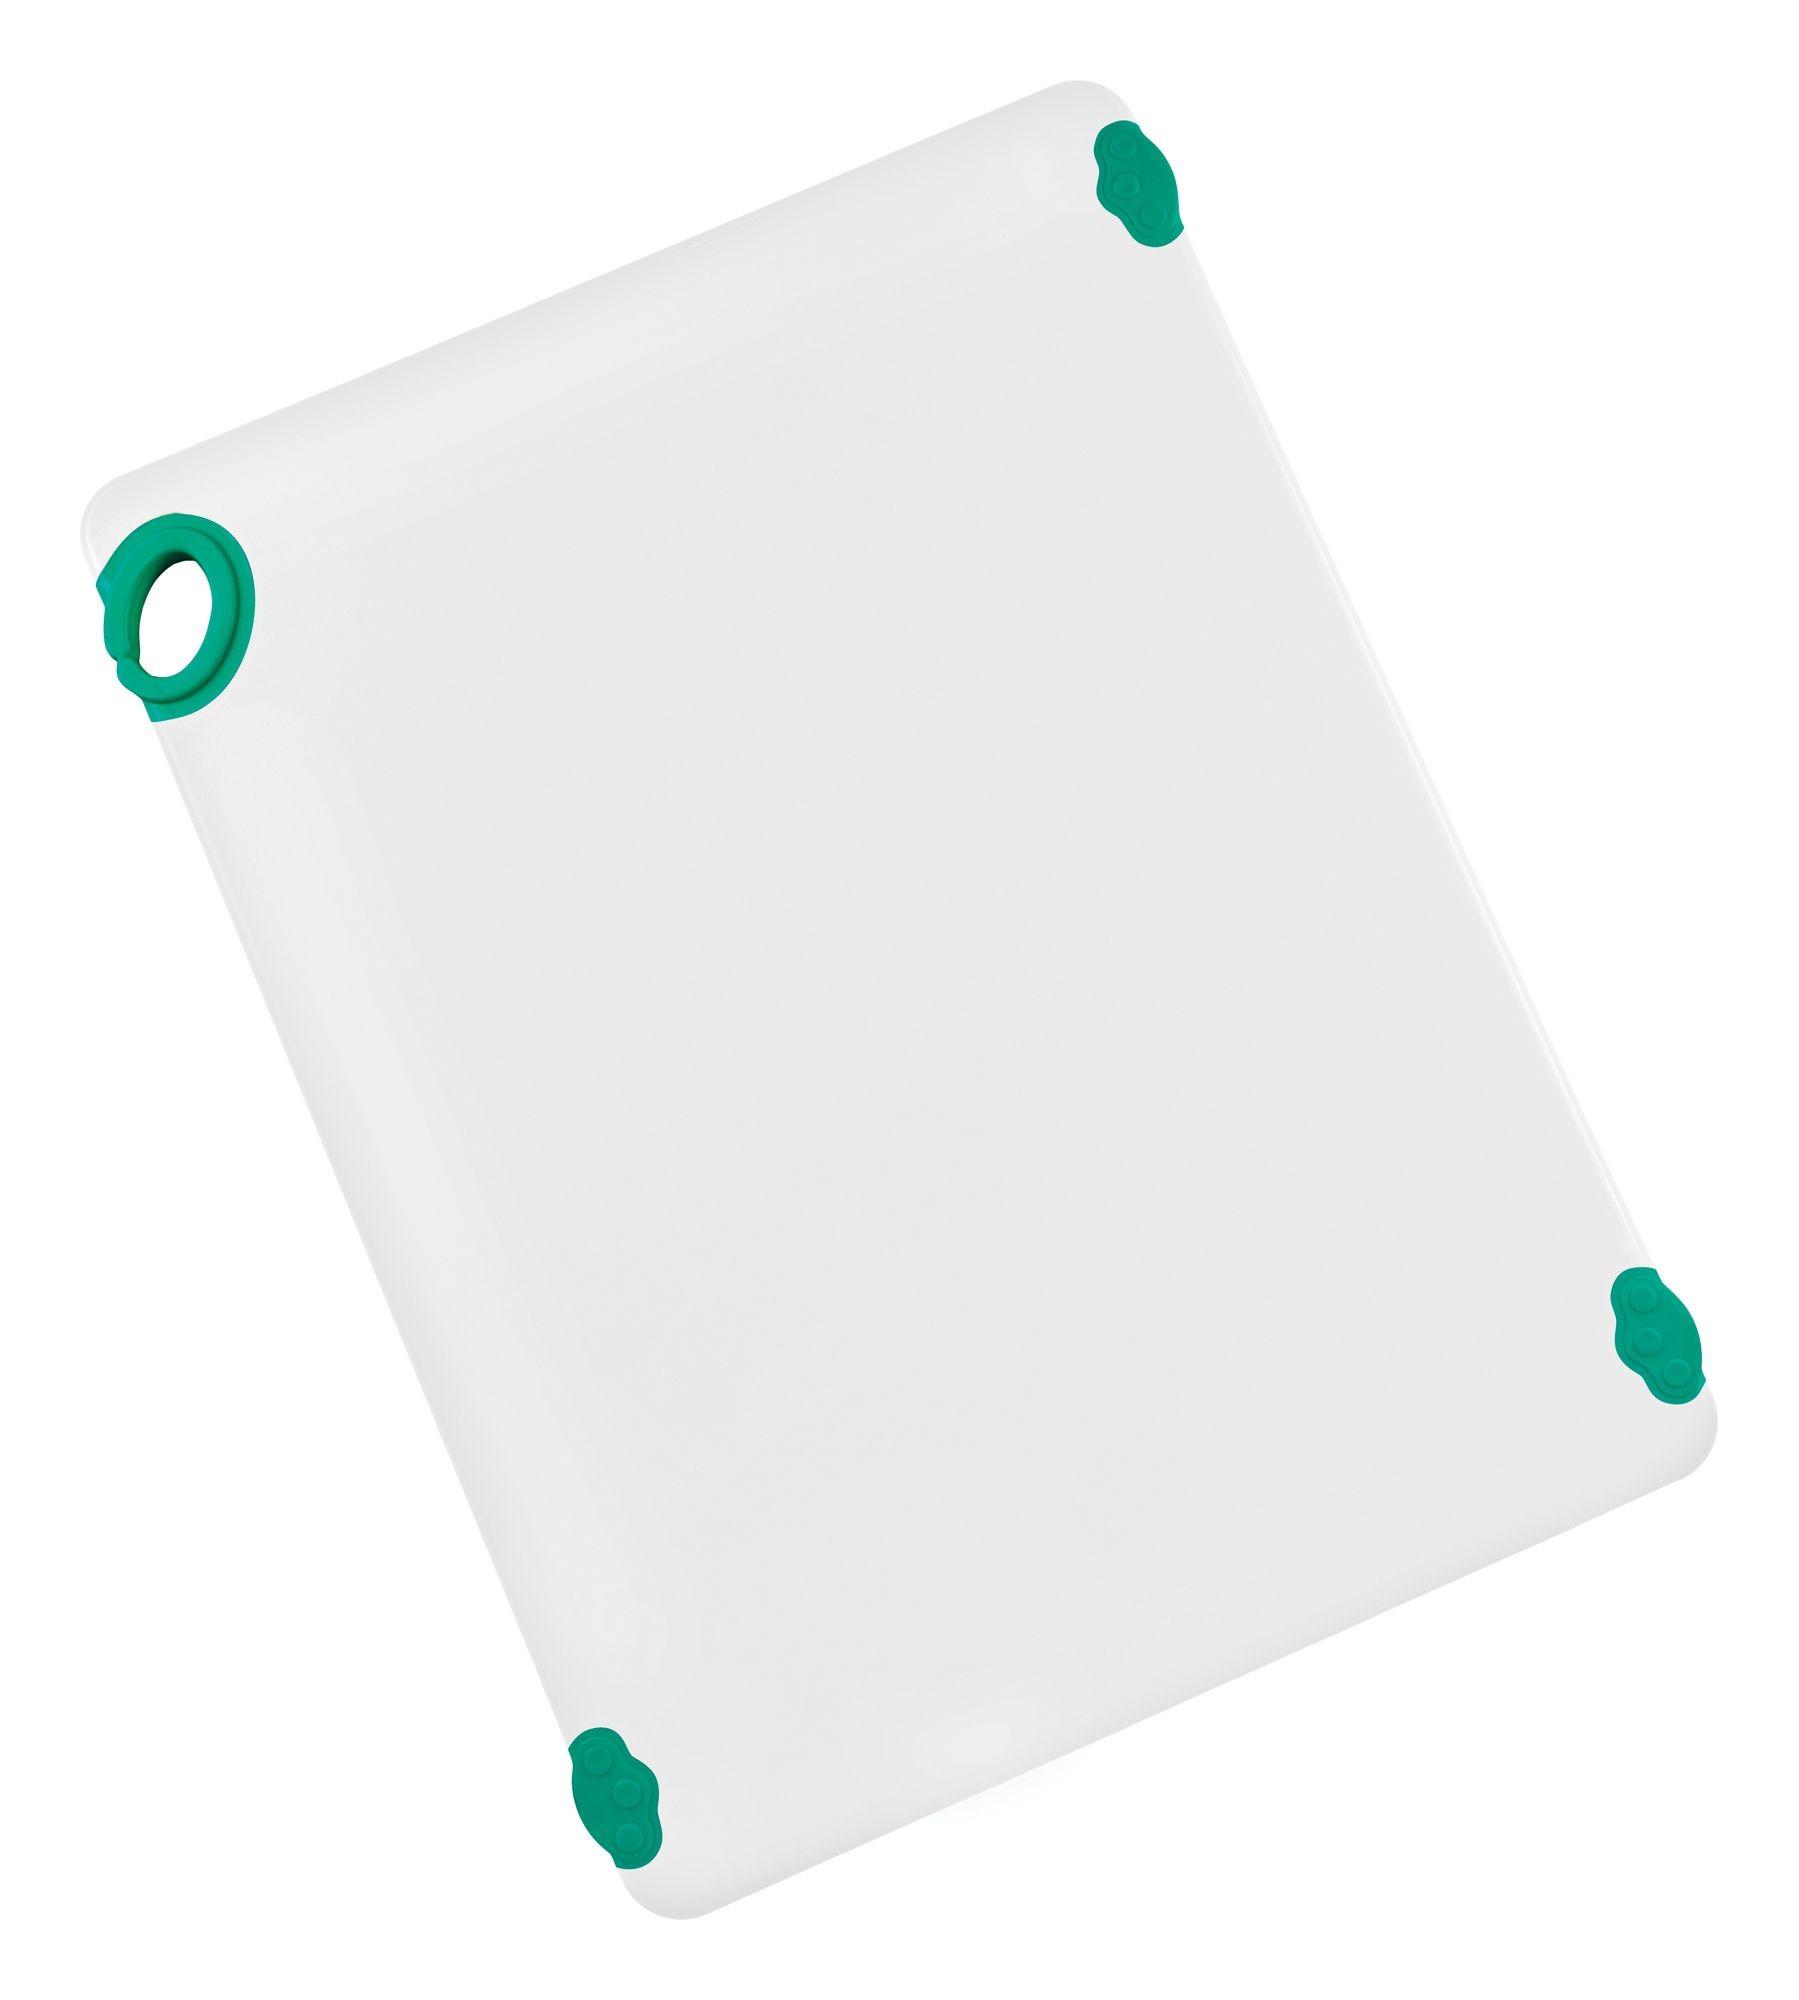 "Winco CBN-1824GR Green StatikBoard Cutting Board with Hook,18"" x 24"" x 1/2"""